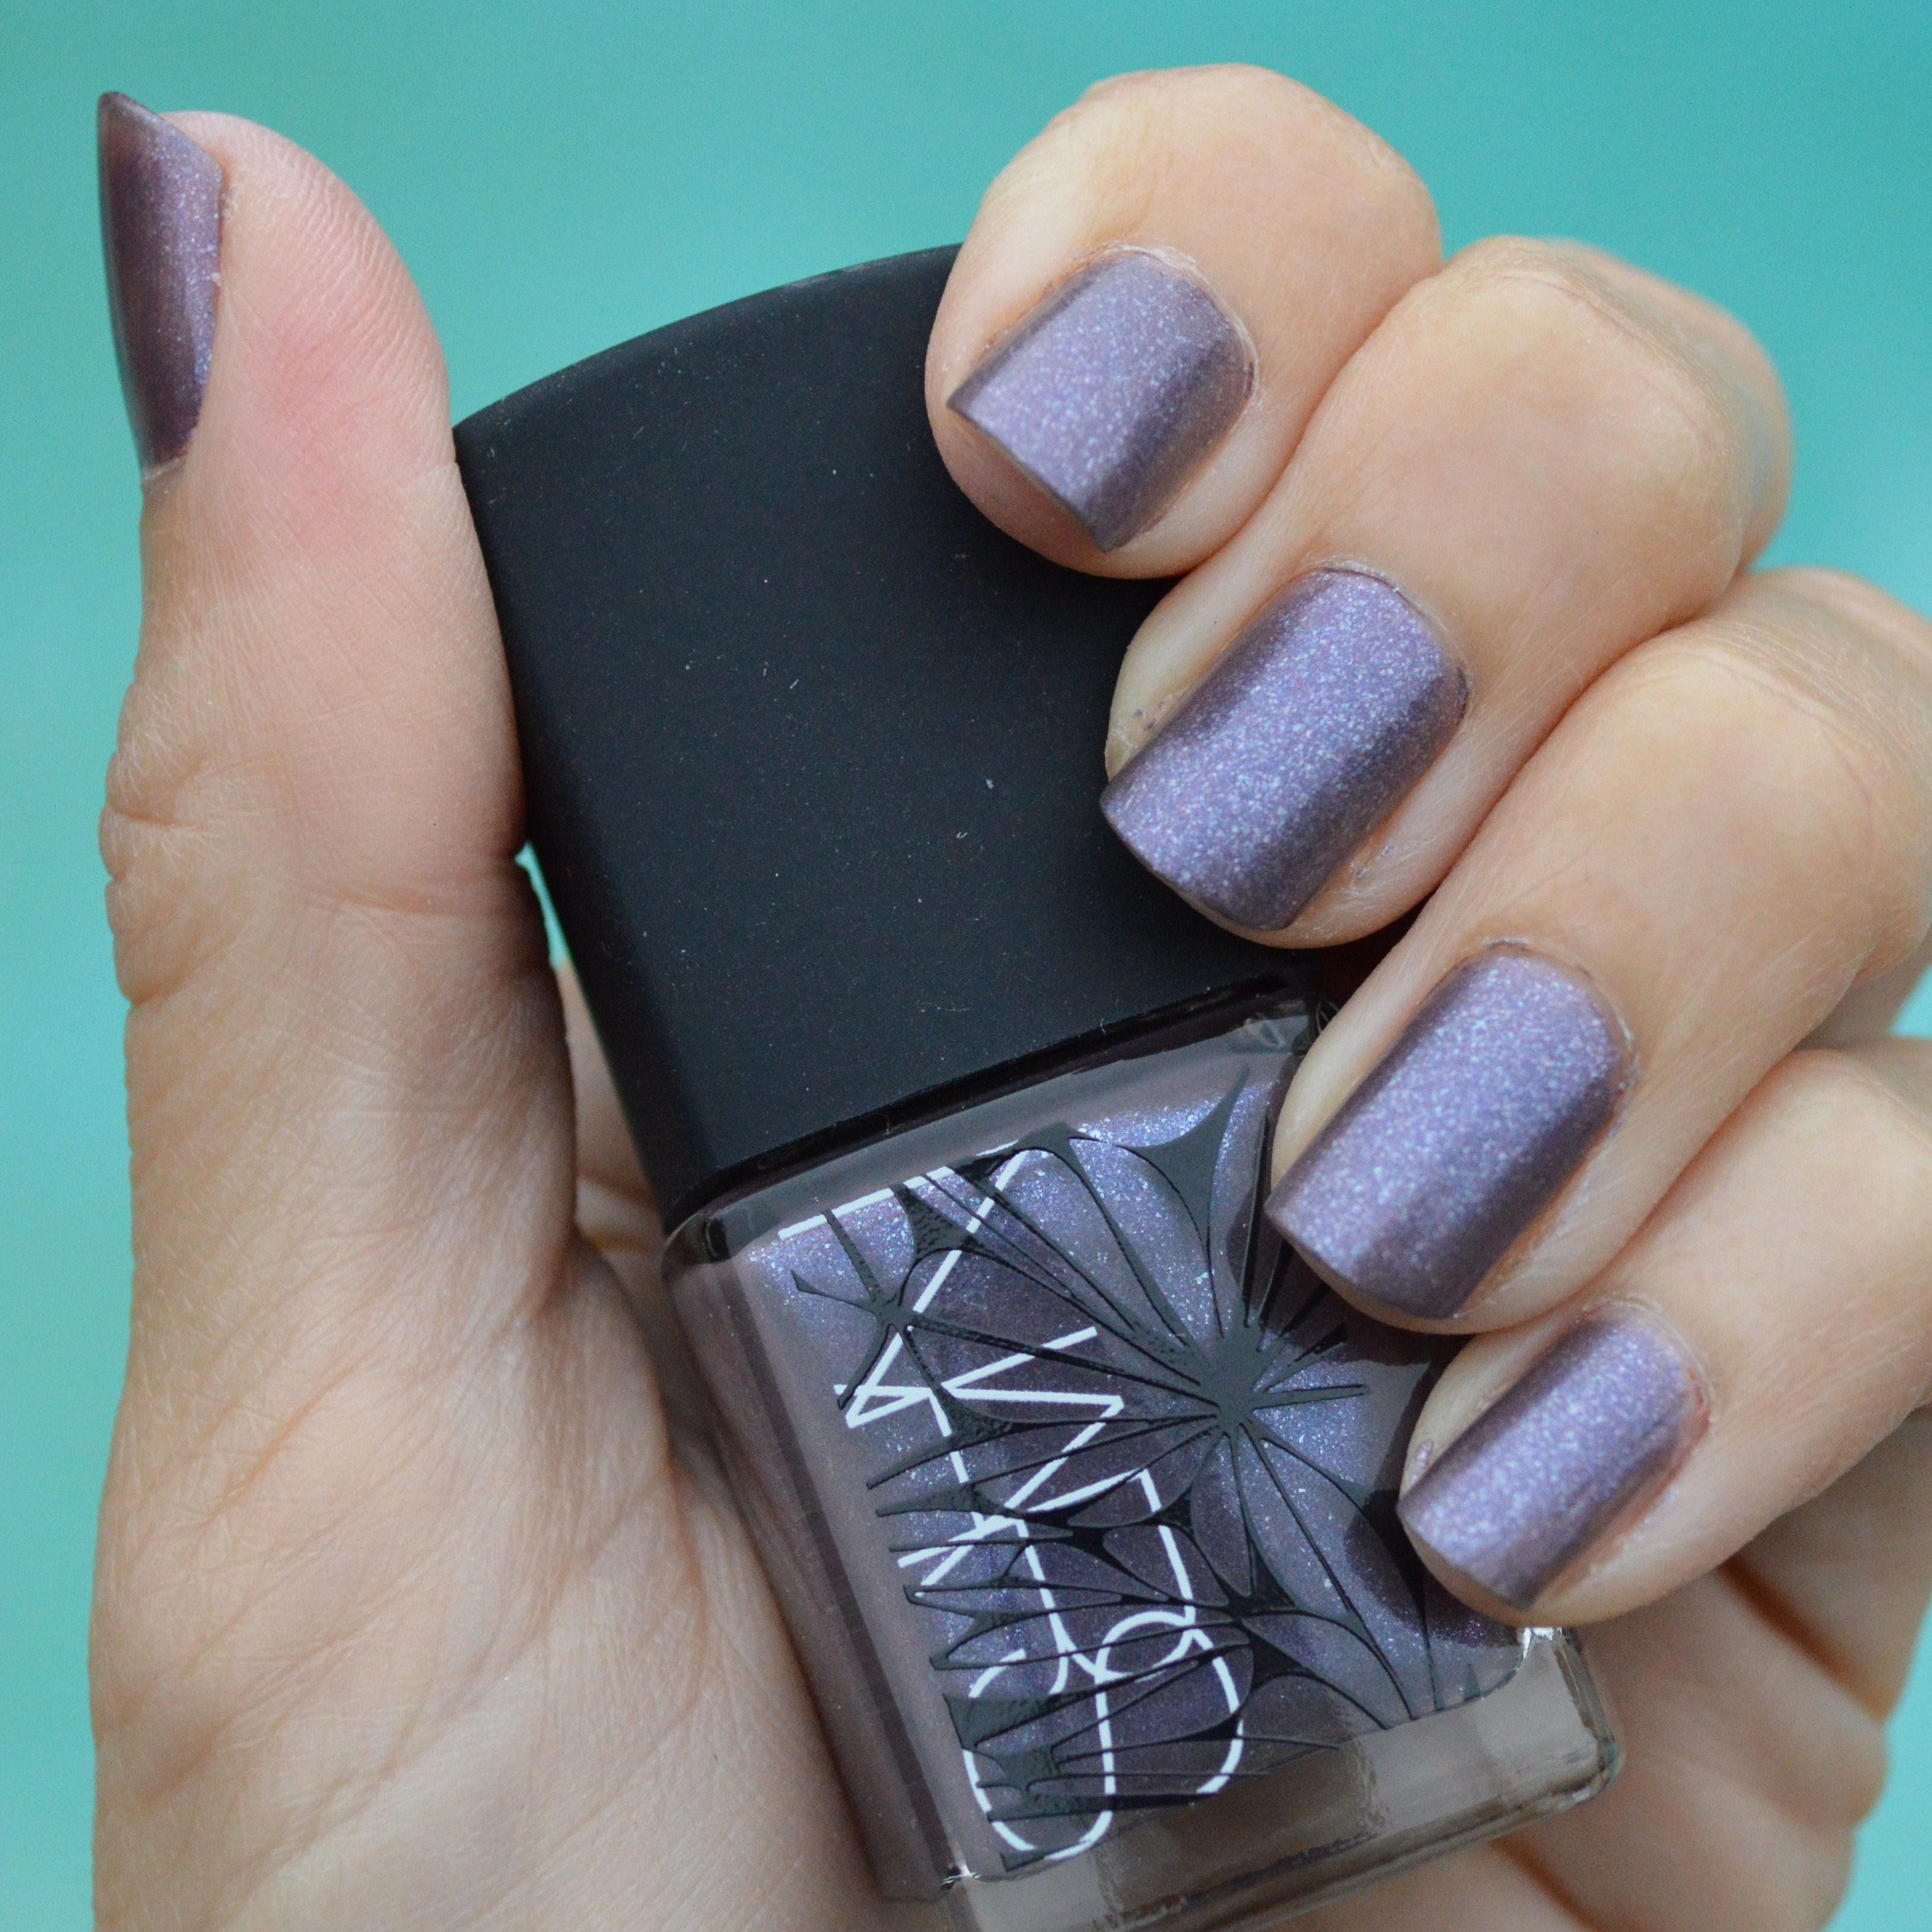 Nail polish colors Nars tone Frivole | NAILS ♥ TOES | Pinterest ...